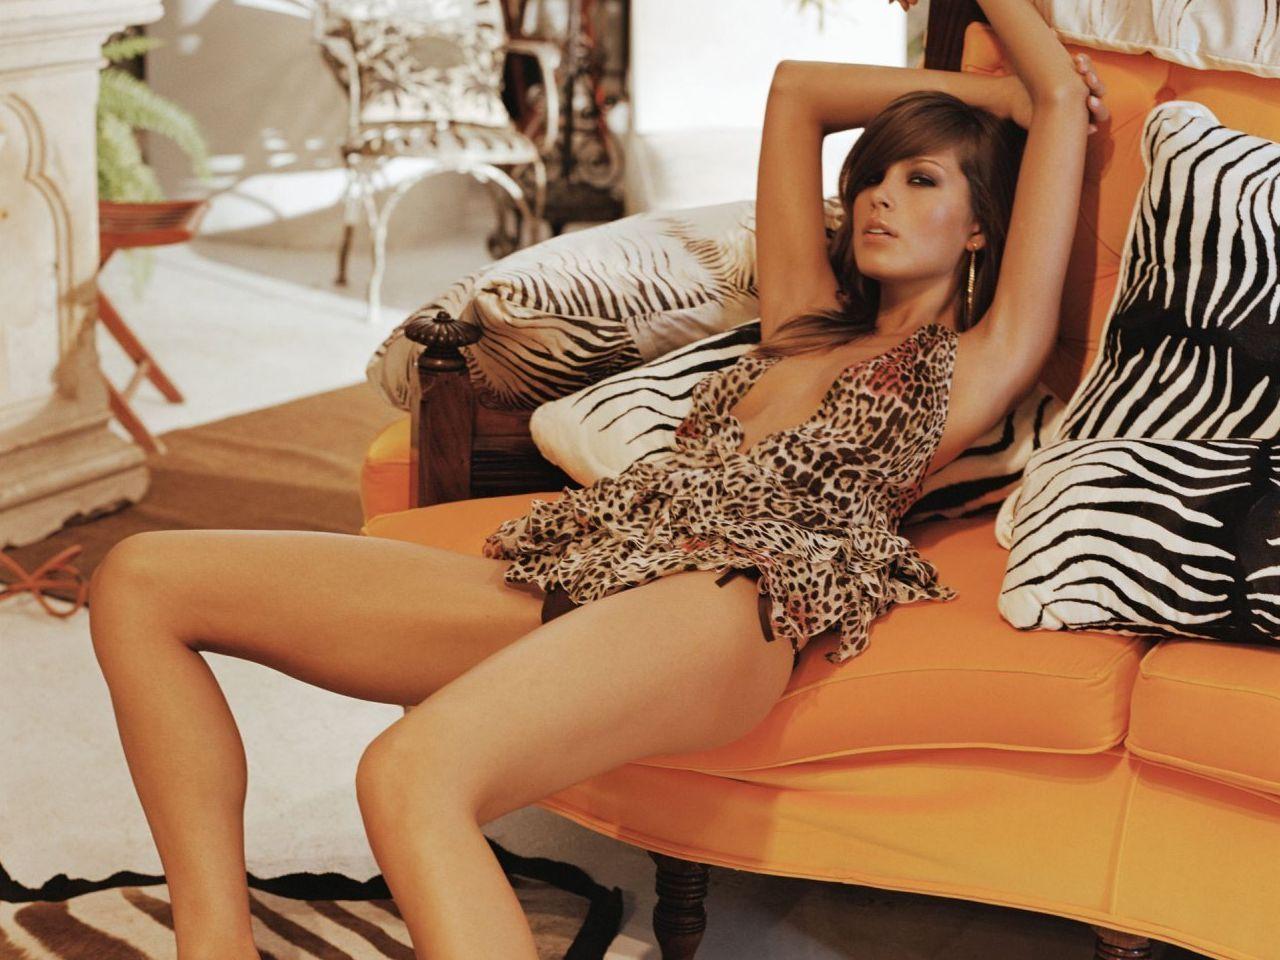 Celebrities in Hot Bikini: TV Host-Model Petra Nemcova in Bikini